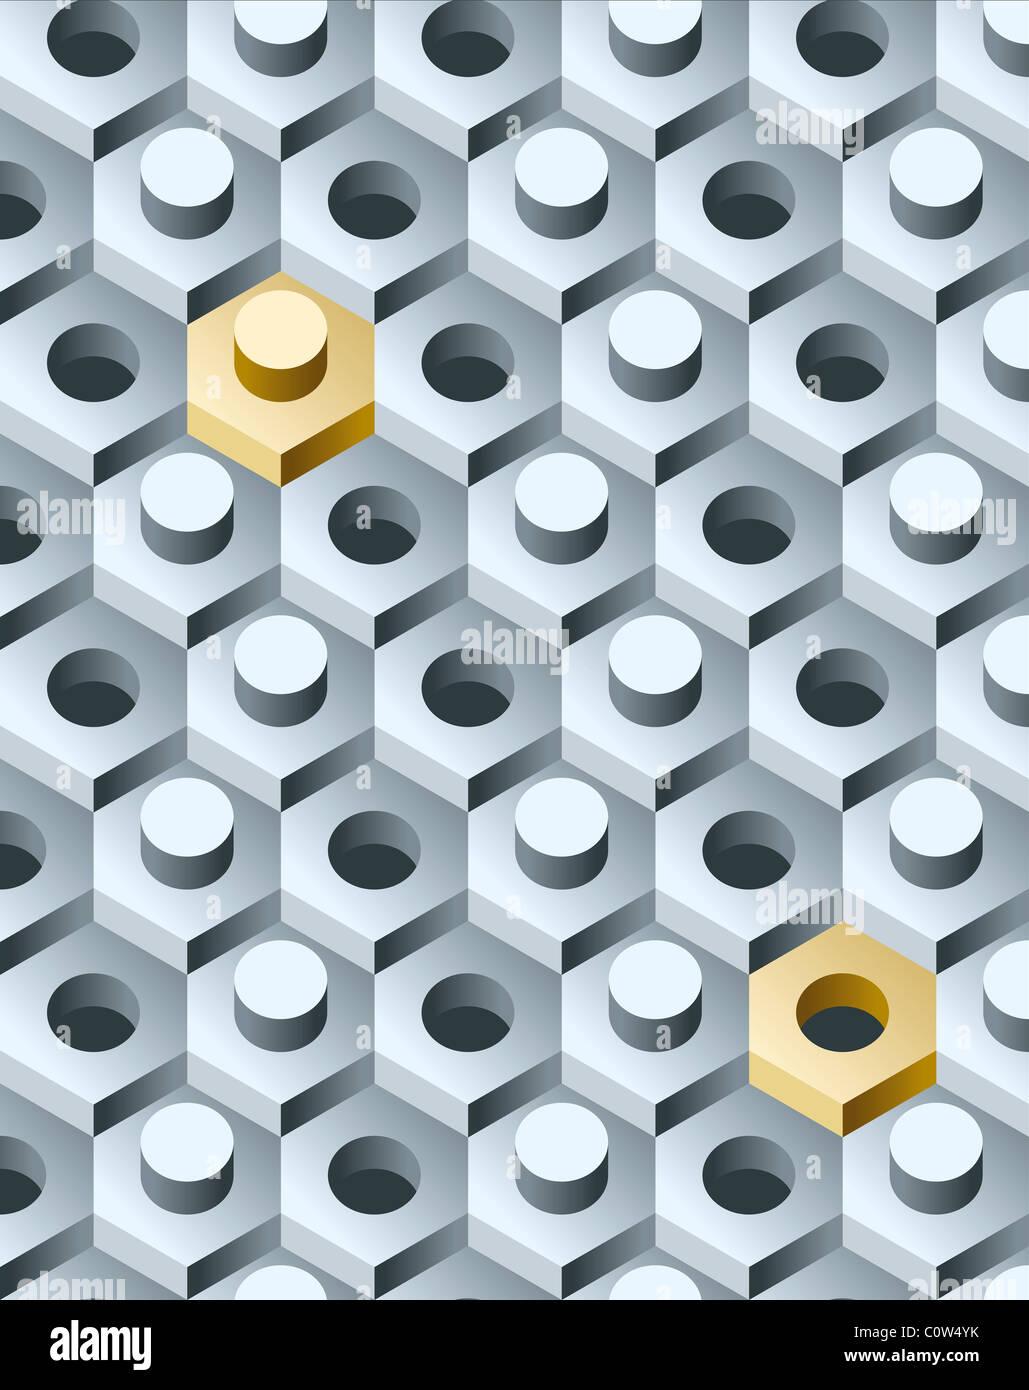 3D pattern - Stock Image